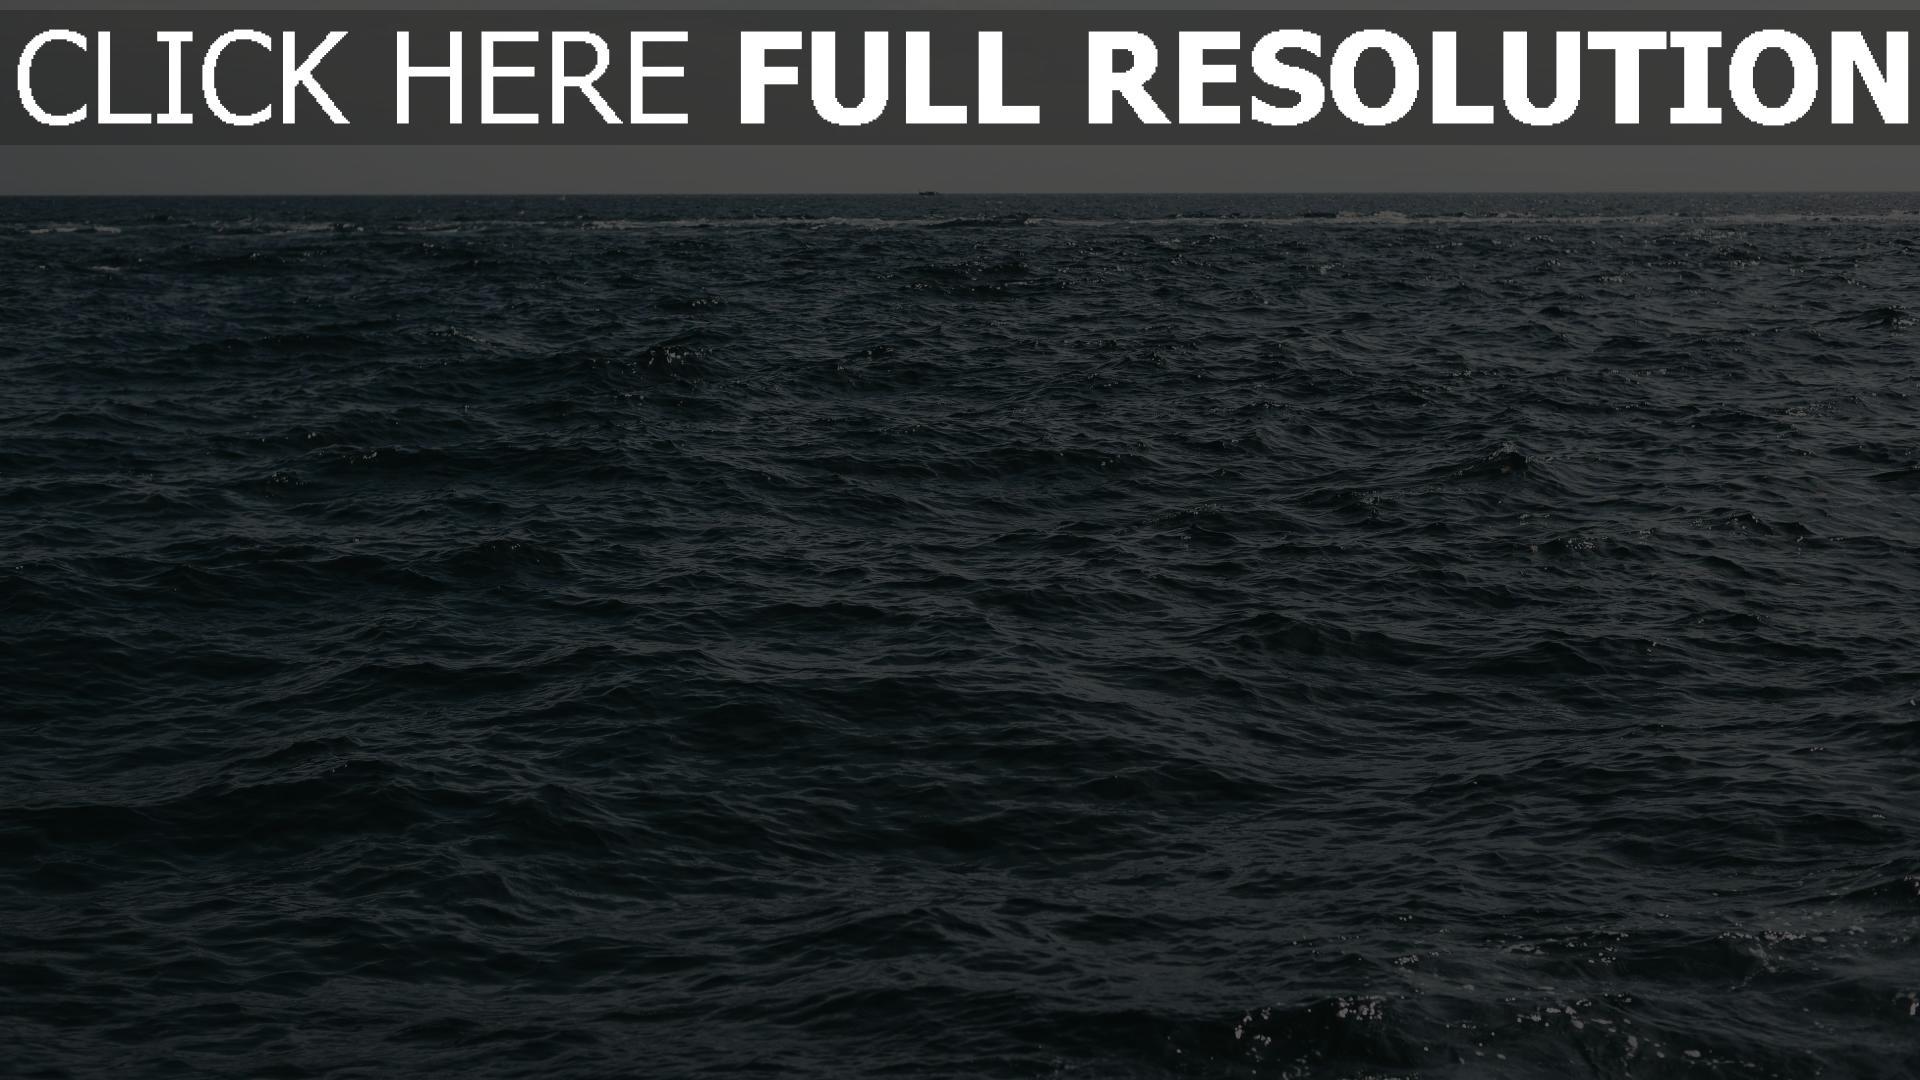 hd hintergrundbilder wellen wasser horizont meer 1920x1080